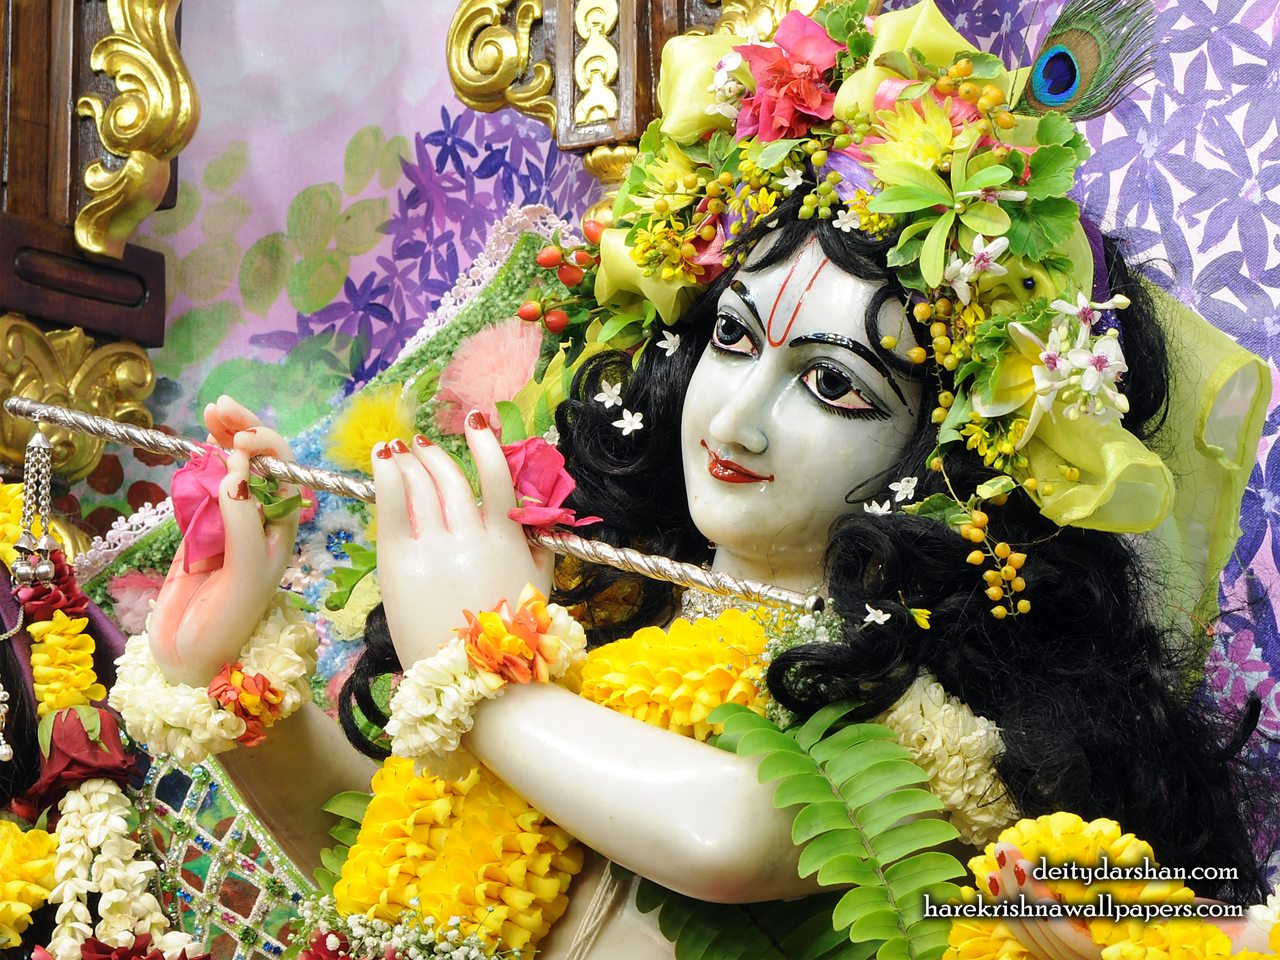 Sri Gopinath Close up Wallpaper (155) Size 1280x960 Download